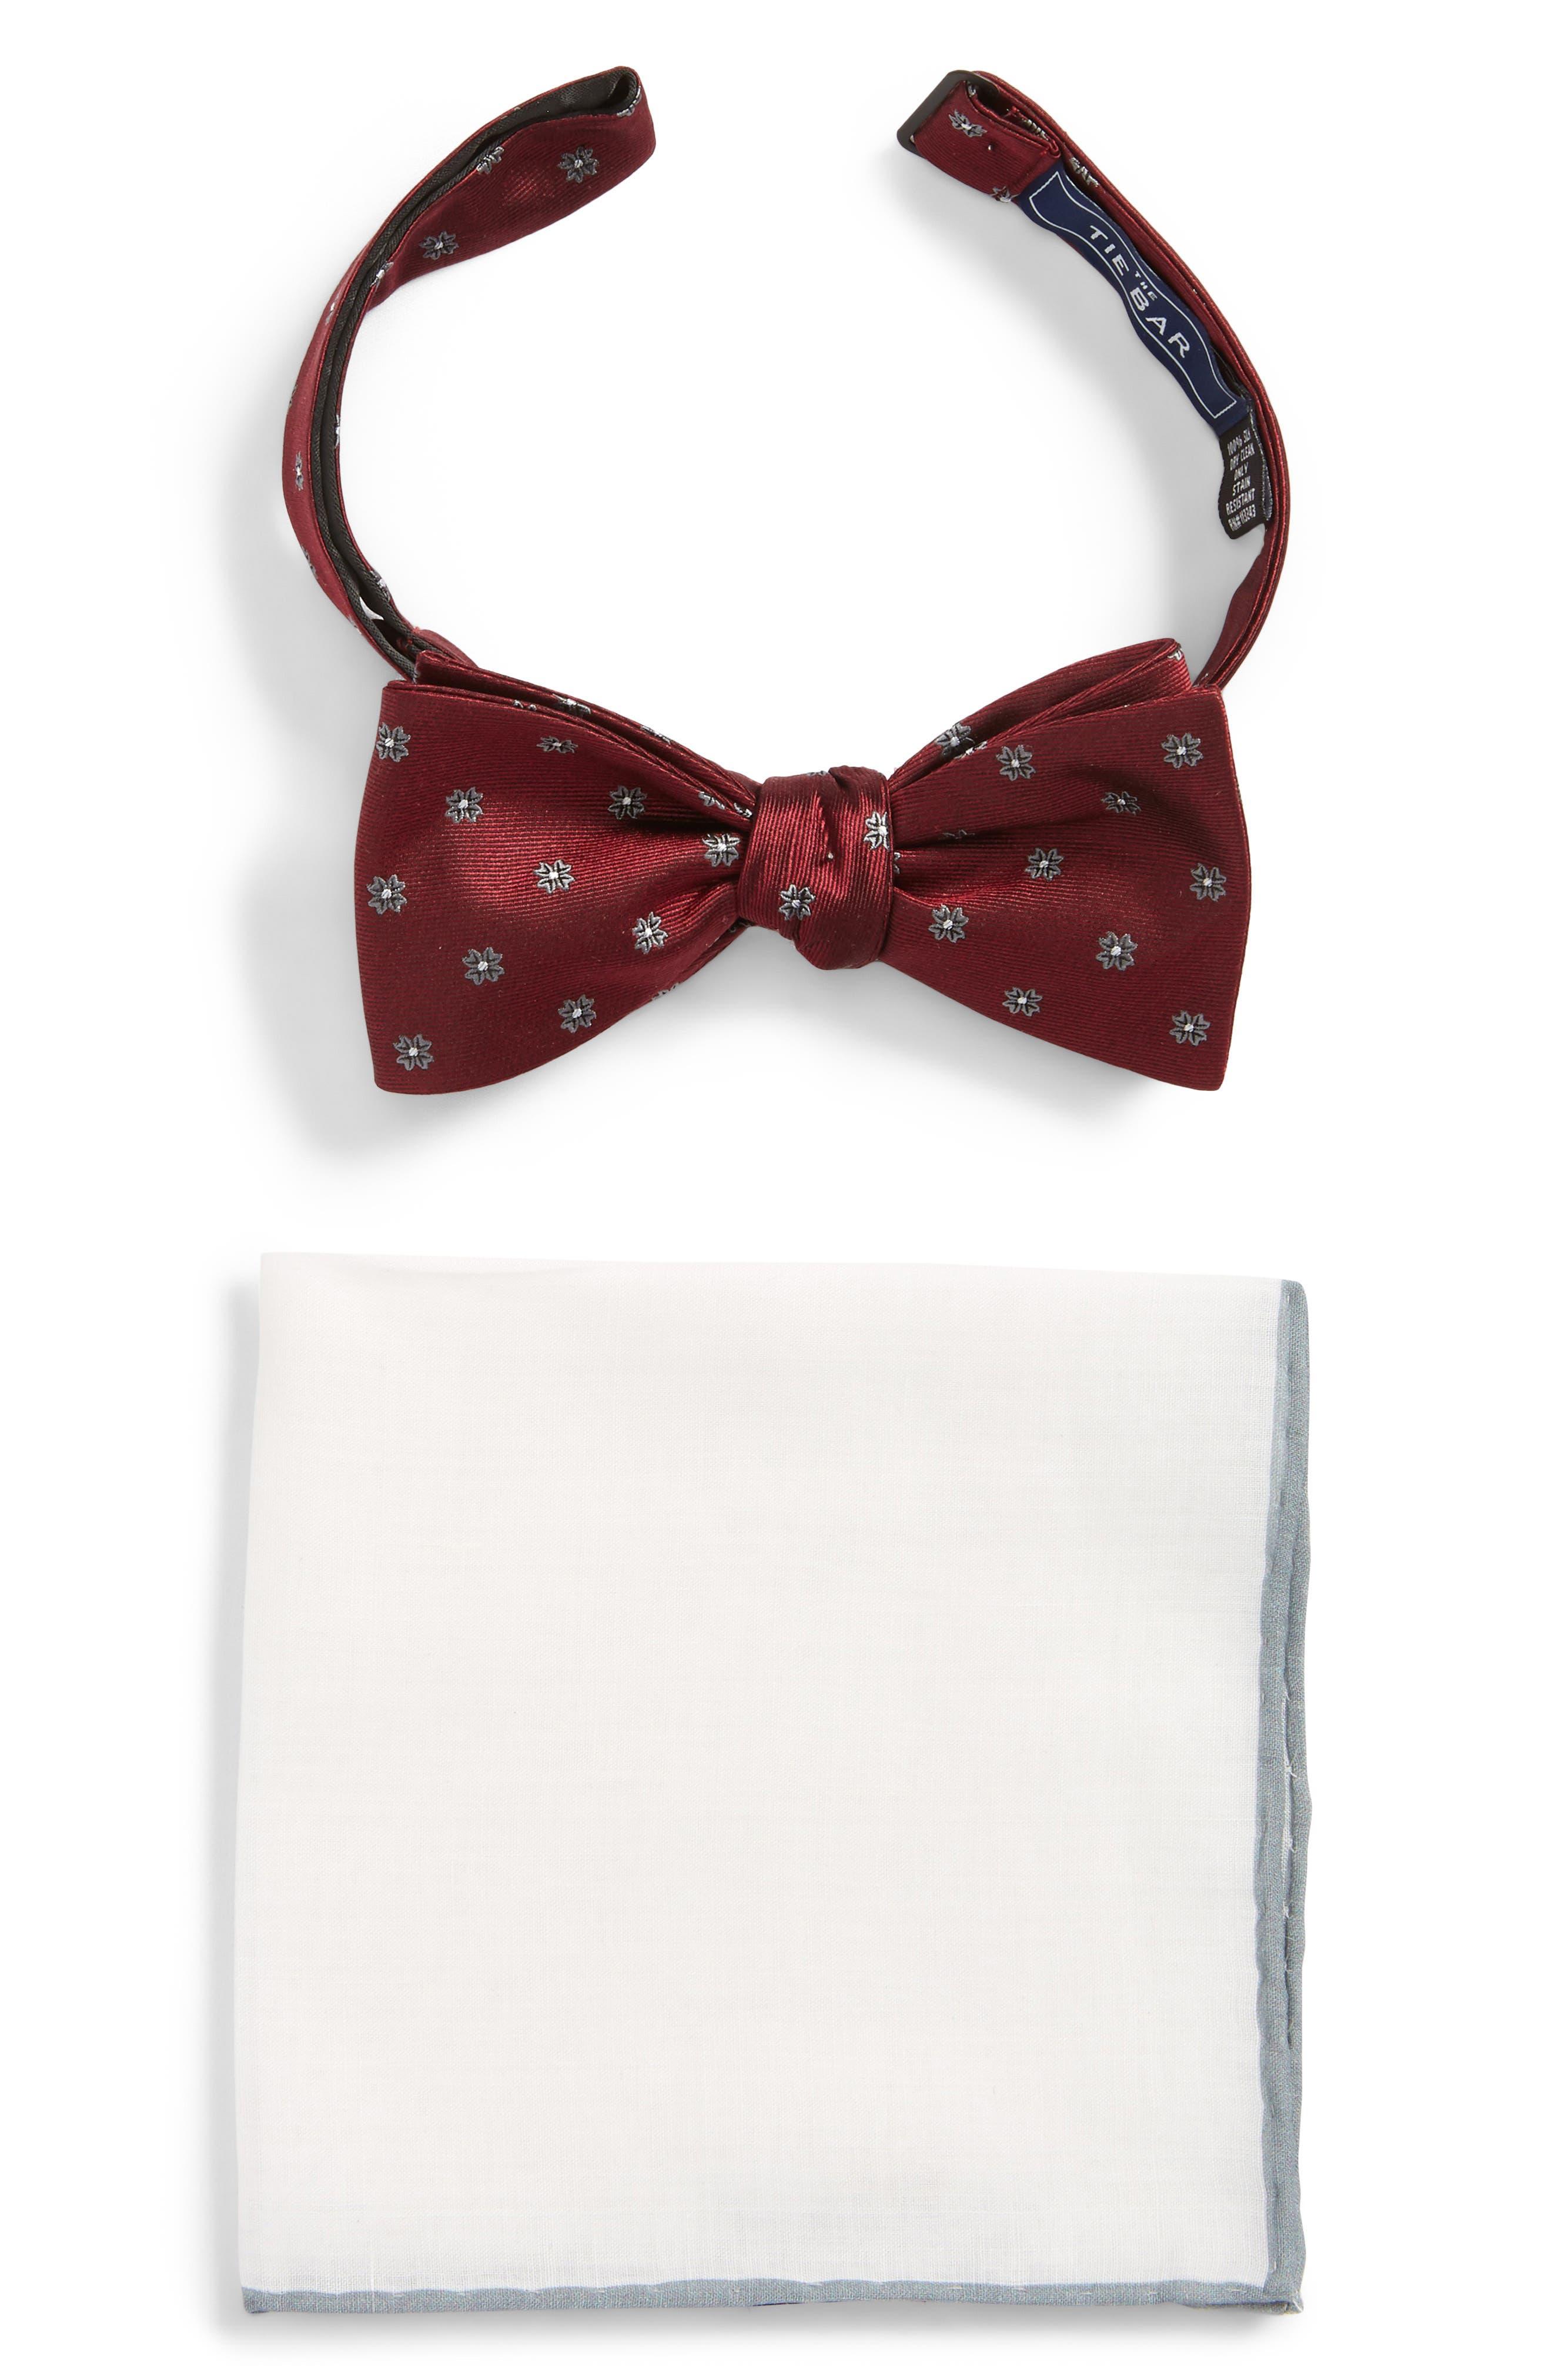 Bow Tie & Pocket Square Box Set,                         Main,                         color, Burgundy